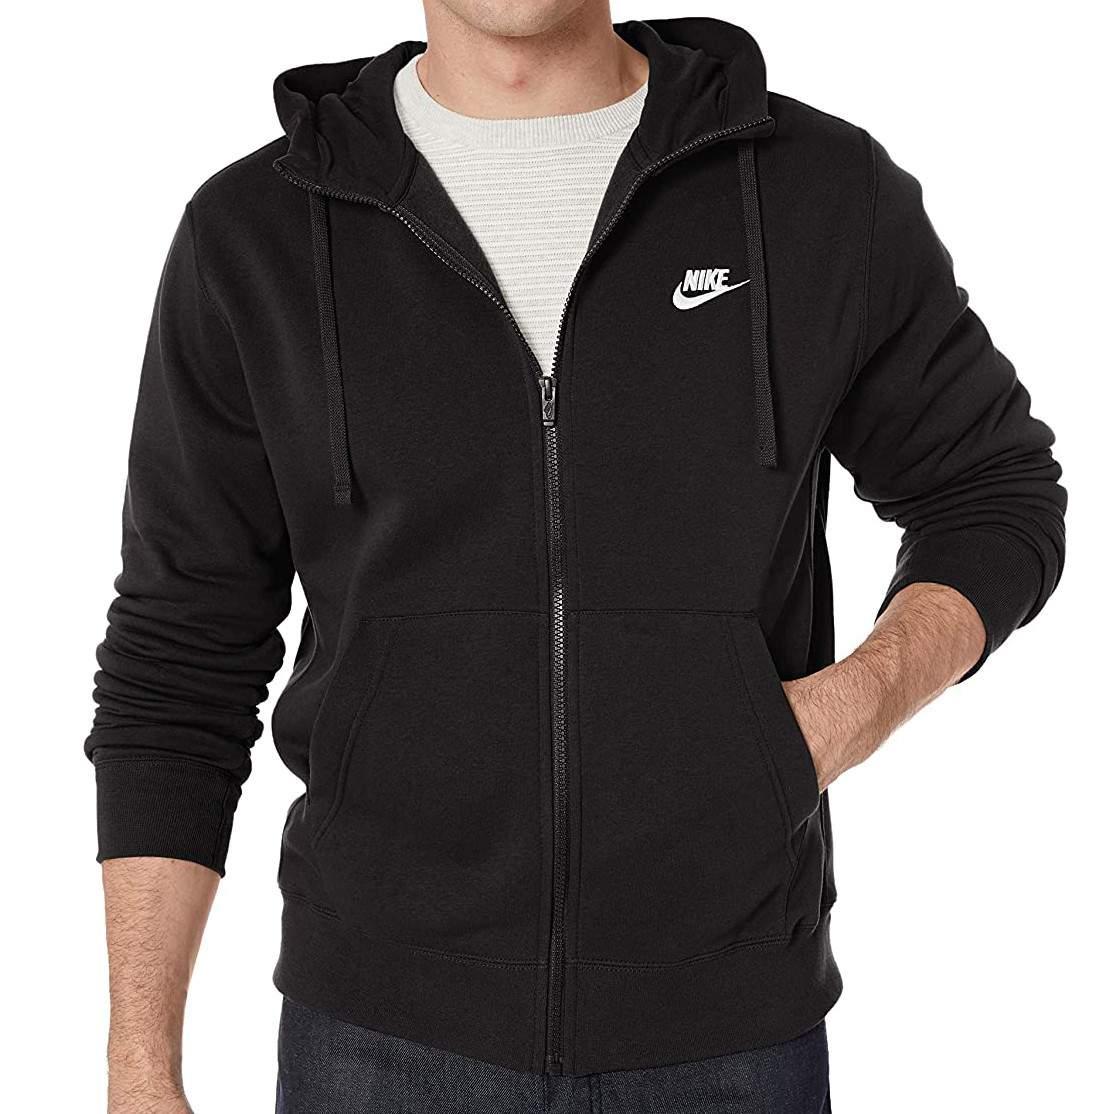 Nike Kabátok webshop, 2020 as trendek   ShopAlike